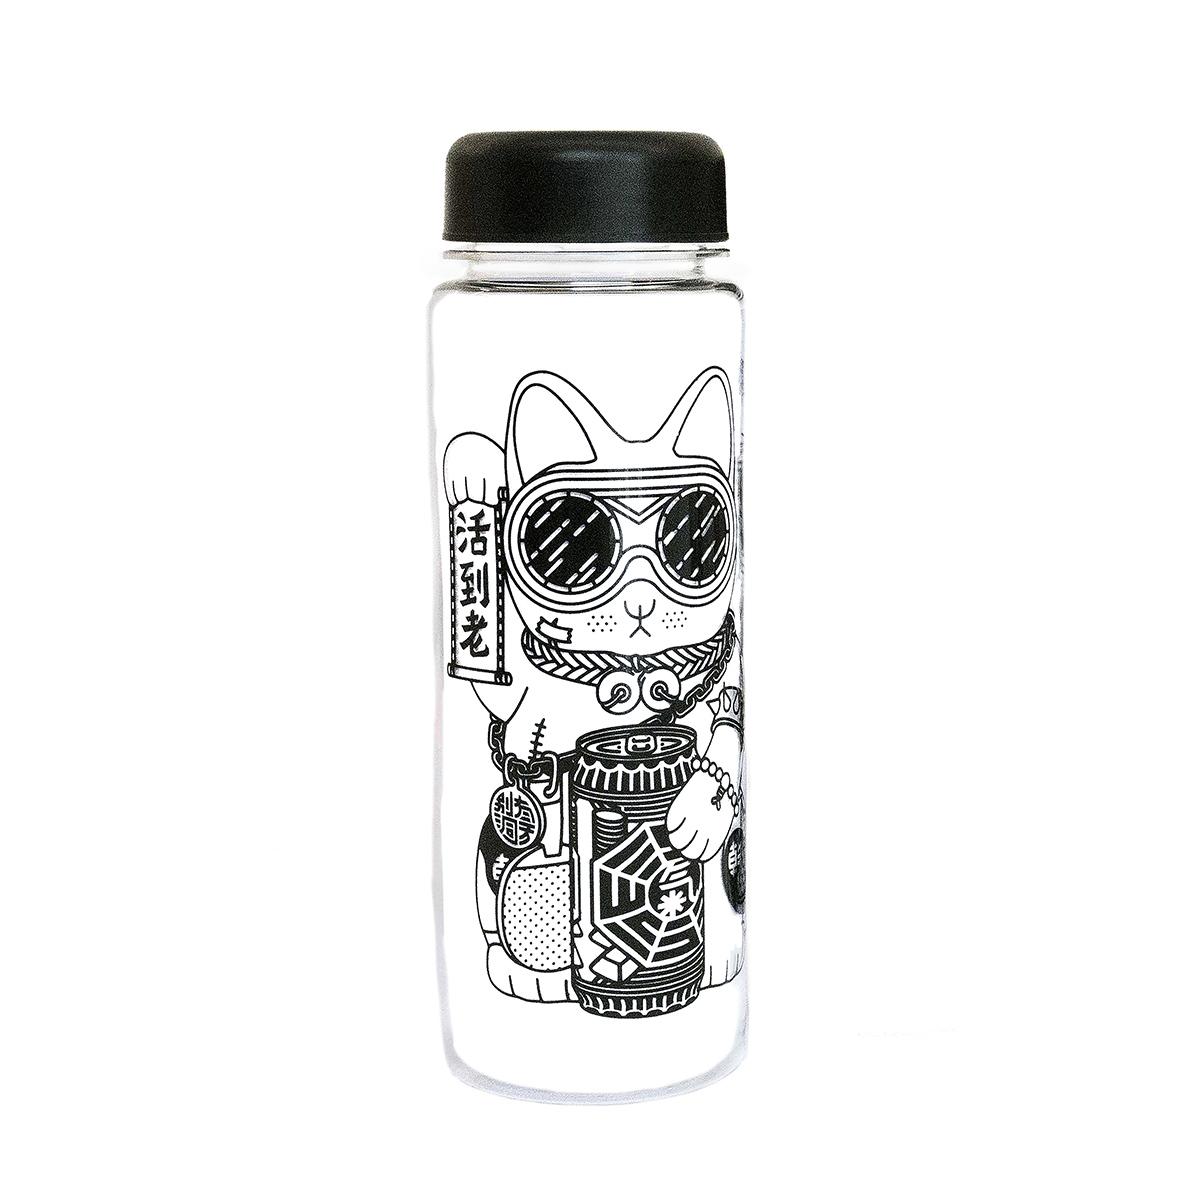 Gangster kitty water bottle (right)